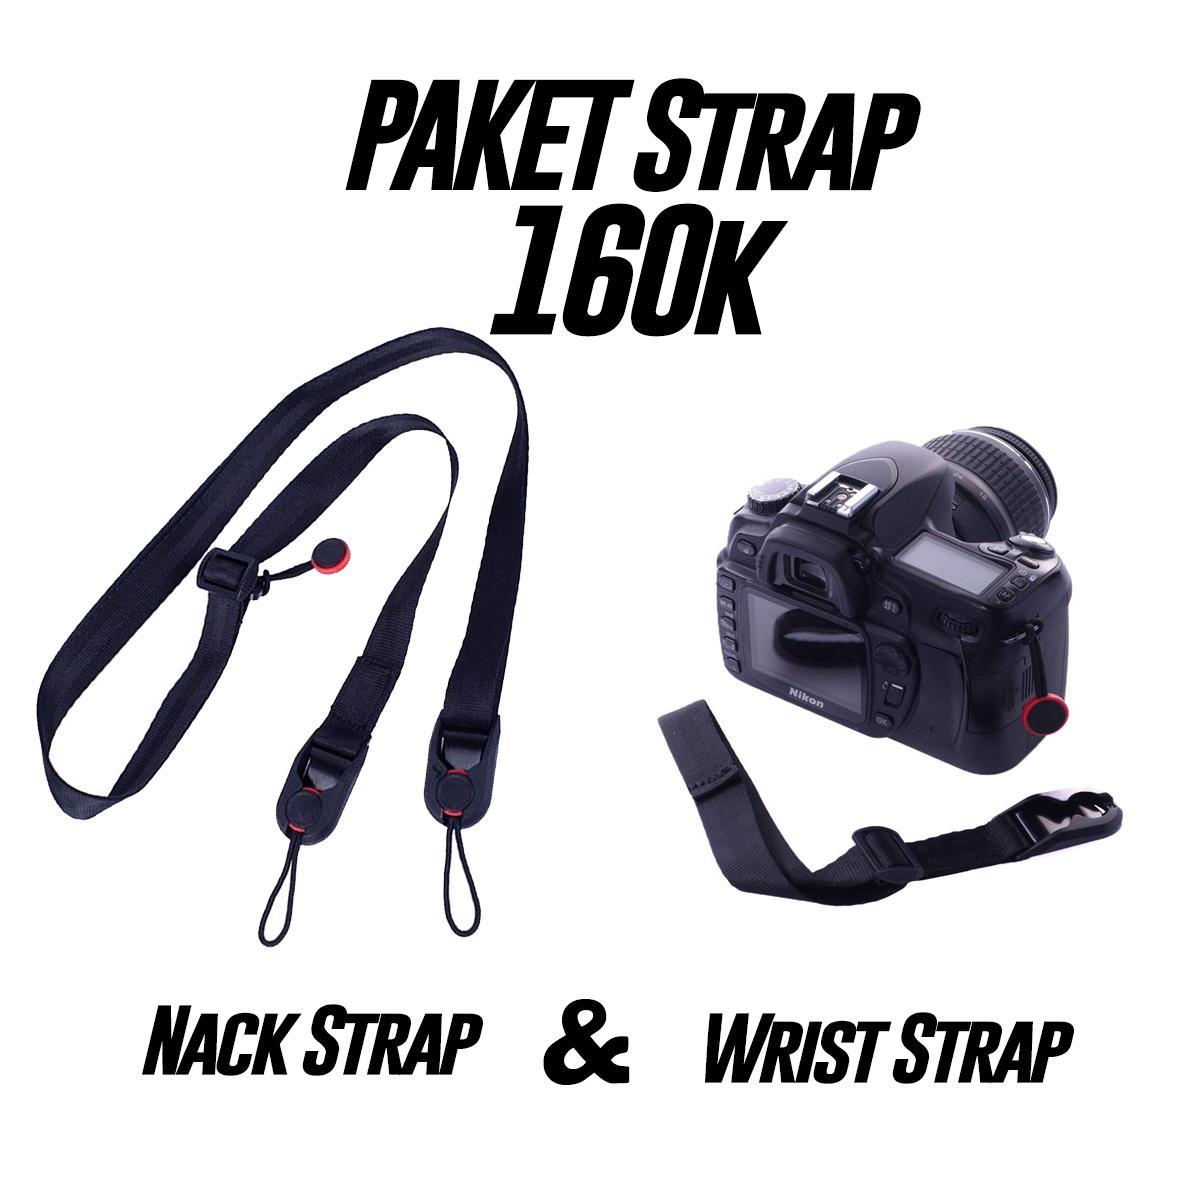 Paket Strap Kamera Murah Nack Strap (Head) & Wrist Strap (Hand) ala Peak Design Strap Canon Sony Nikon Fuji Lumix tali kamera